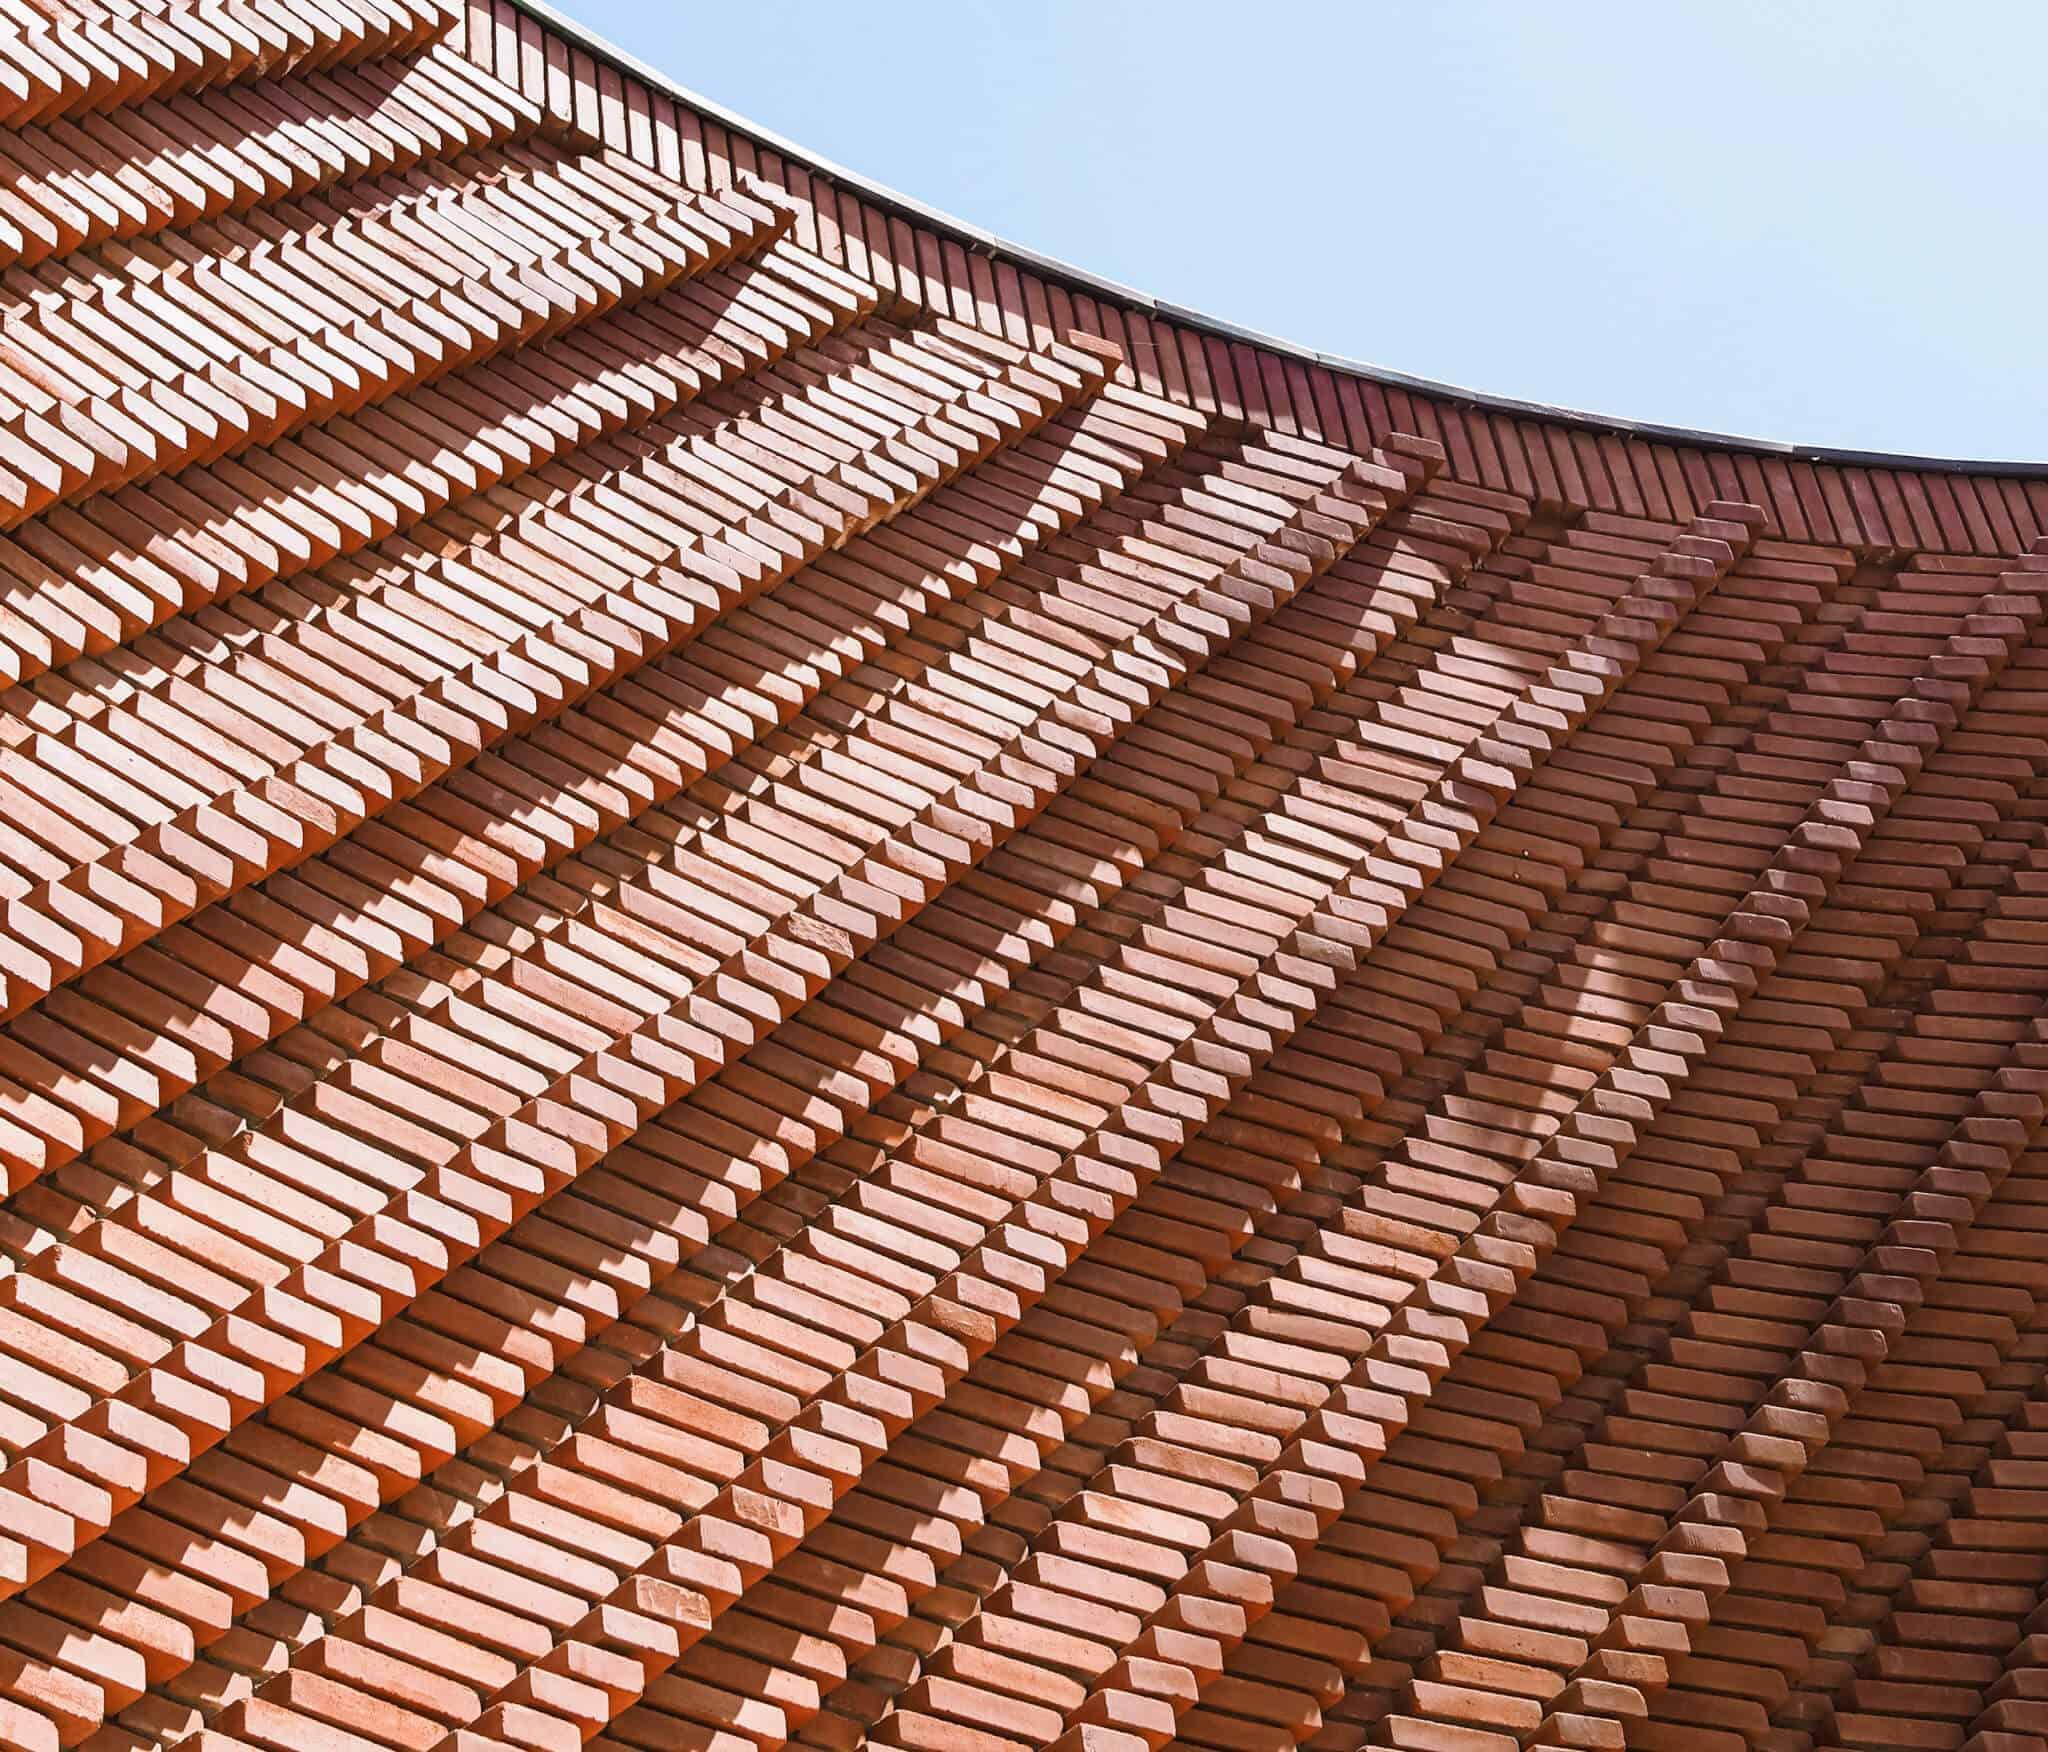 ysl museum brick walls